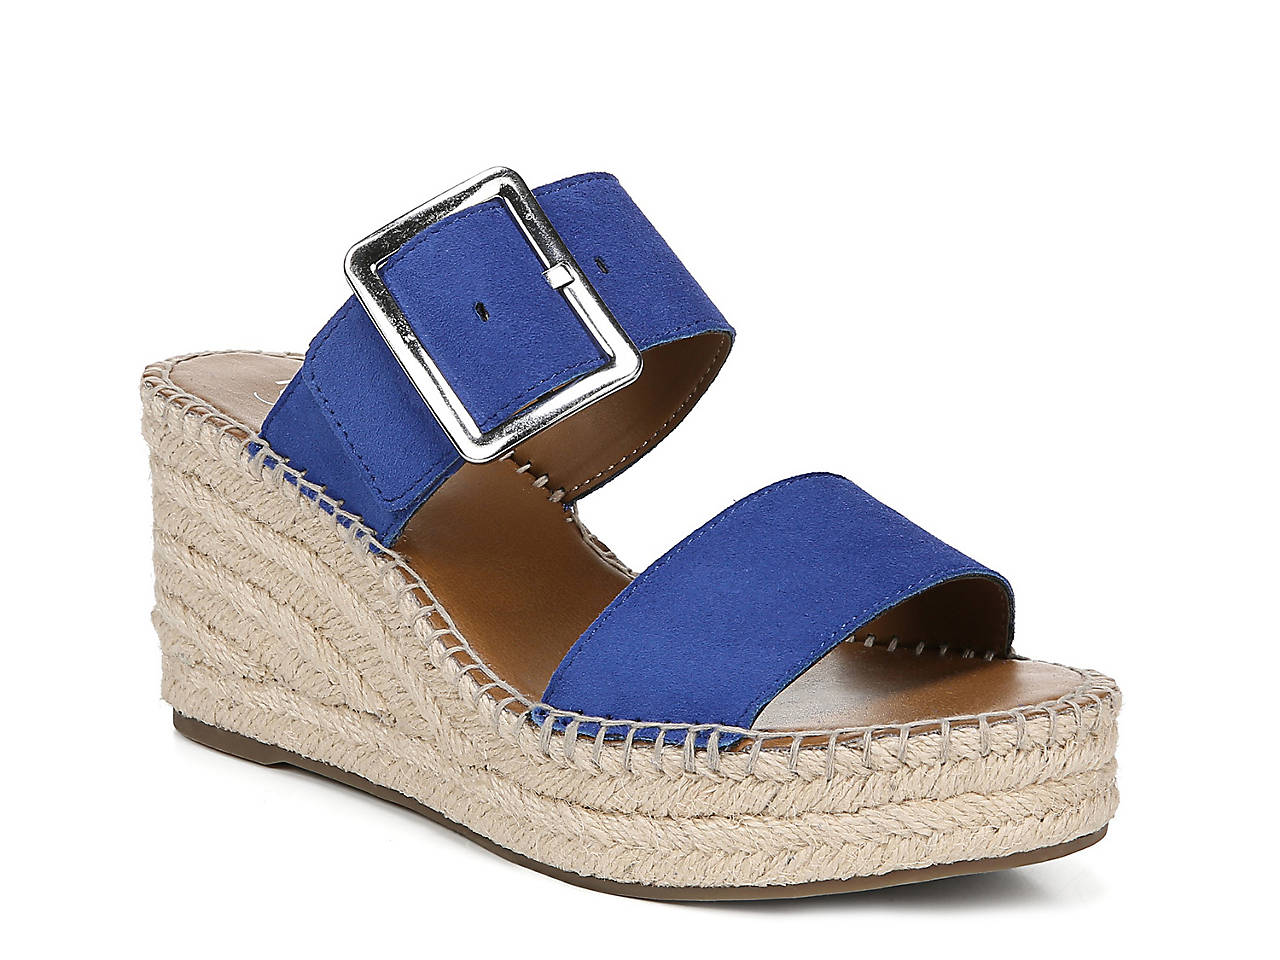 8aeab995c815 Franco Sarto Coastal Espadrille Wedge Sandal Women s Shoes